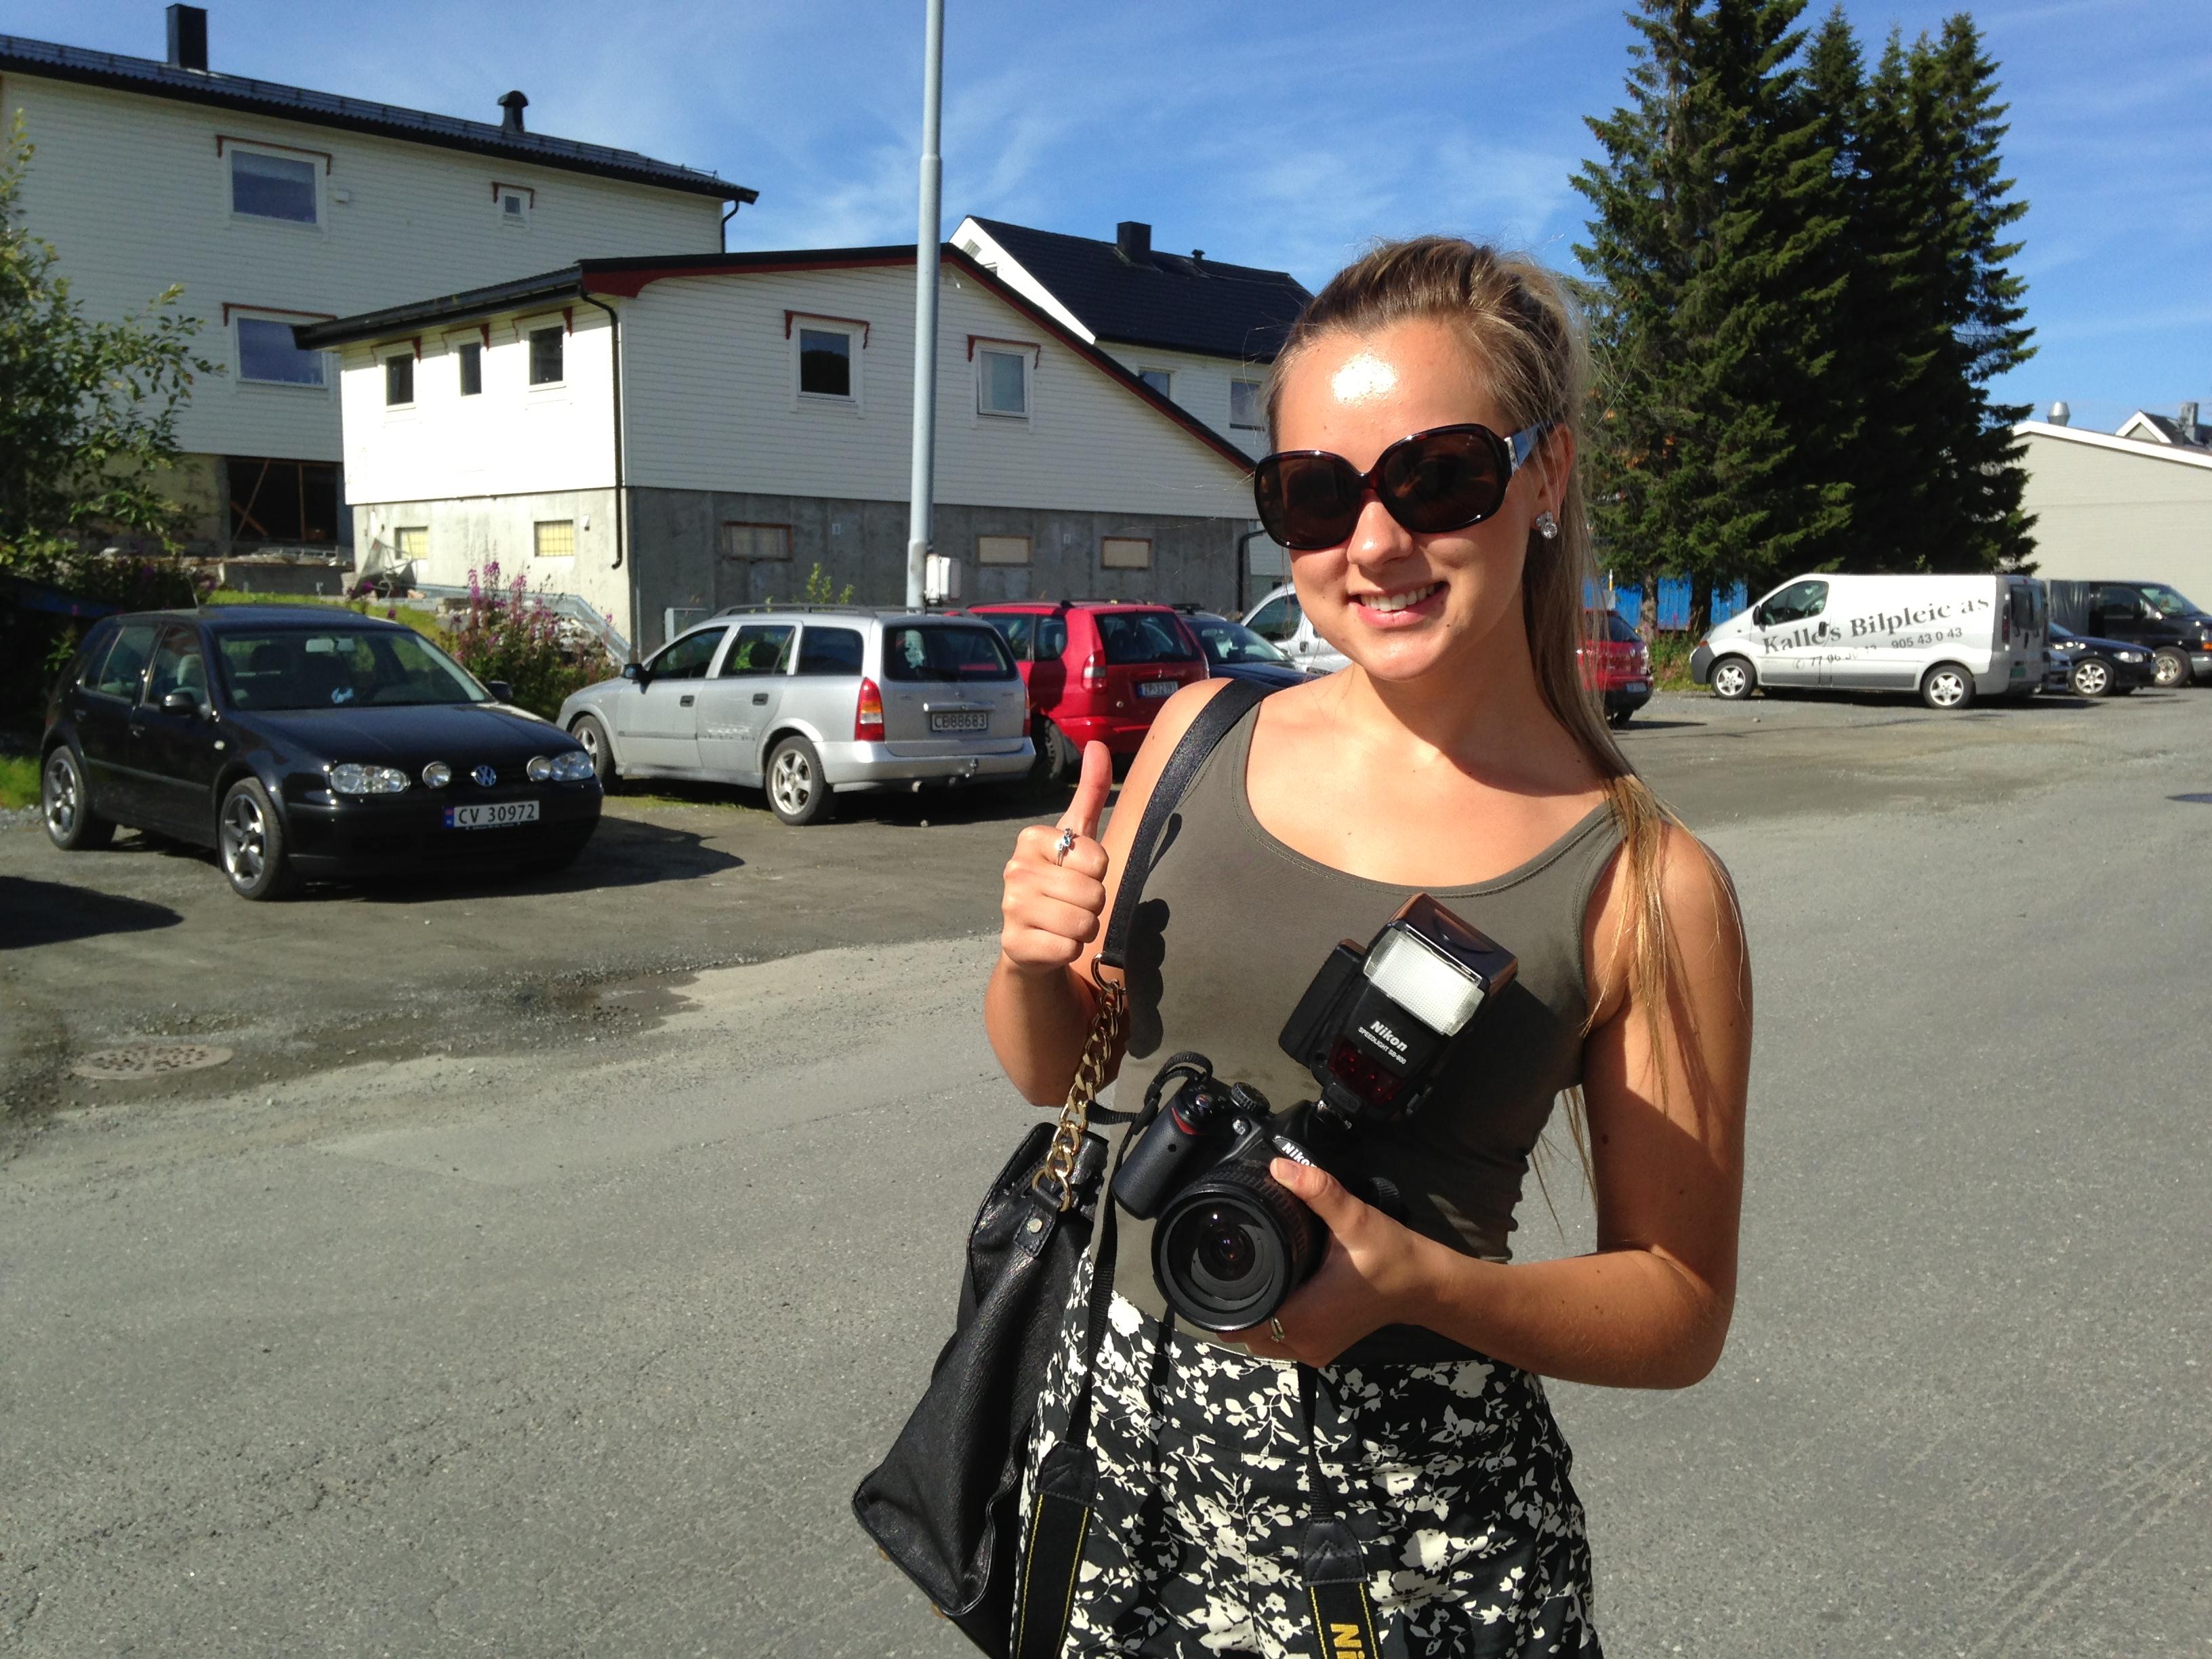 Presseoppslag i Harstad Tidende